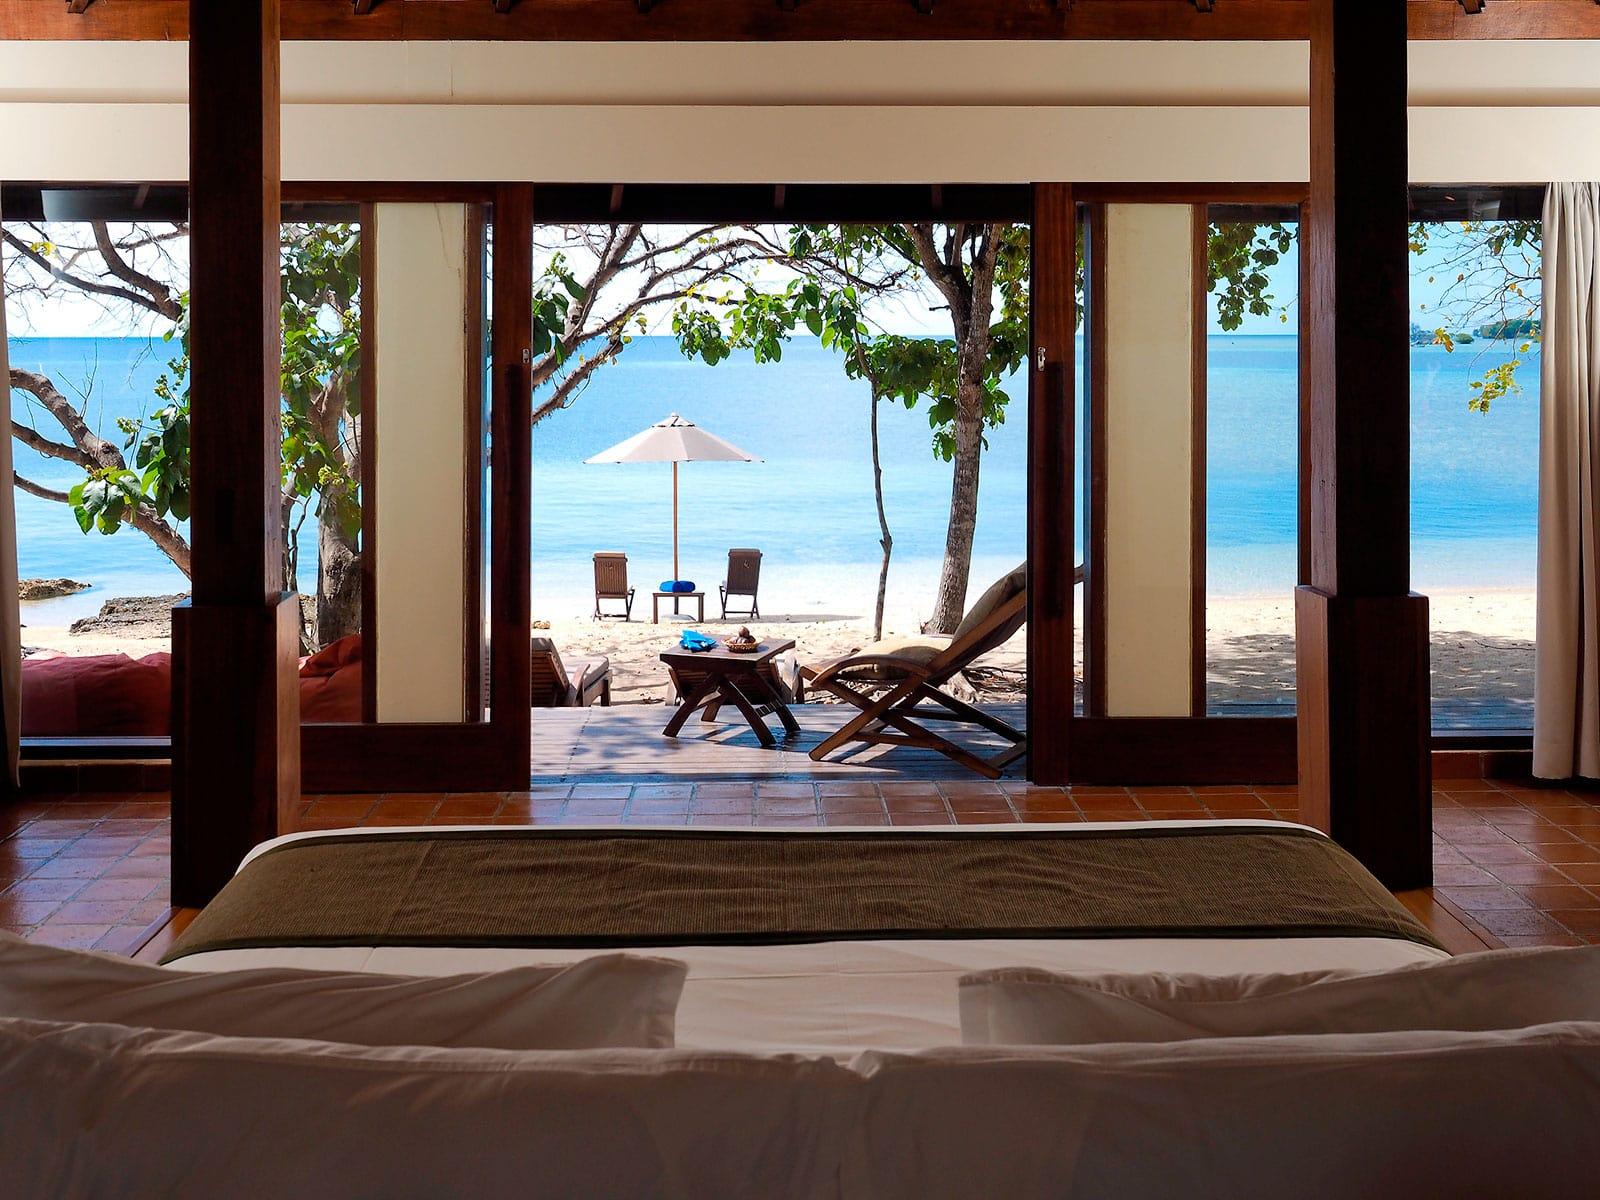 reisspecialist shilla verburgt favoriete hotel menjangan resort bali